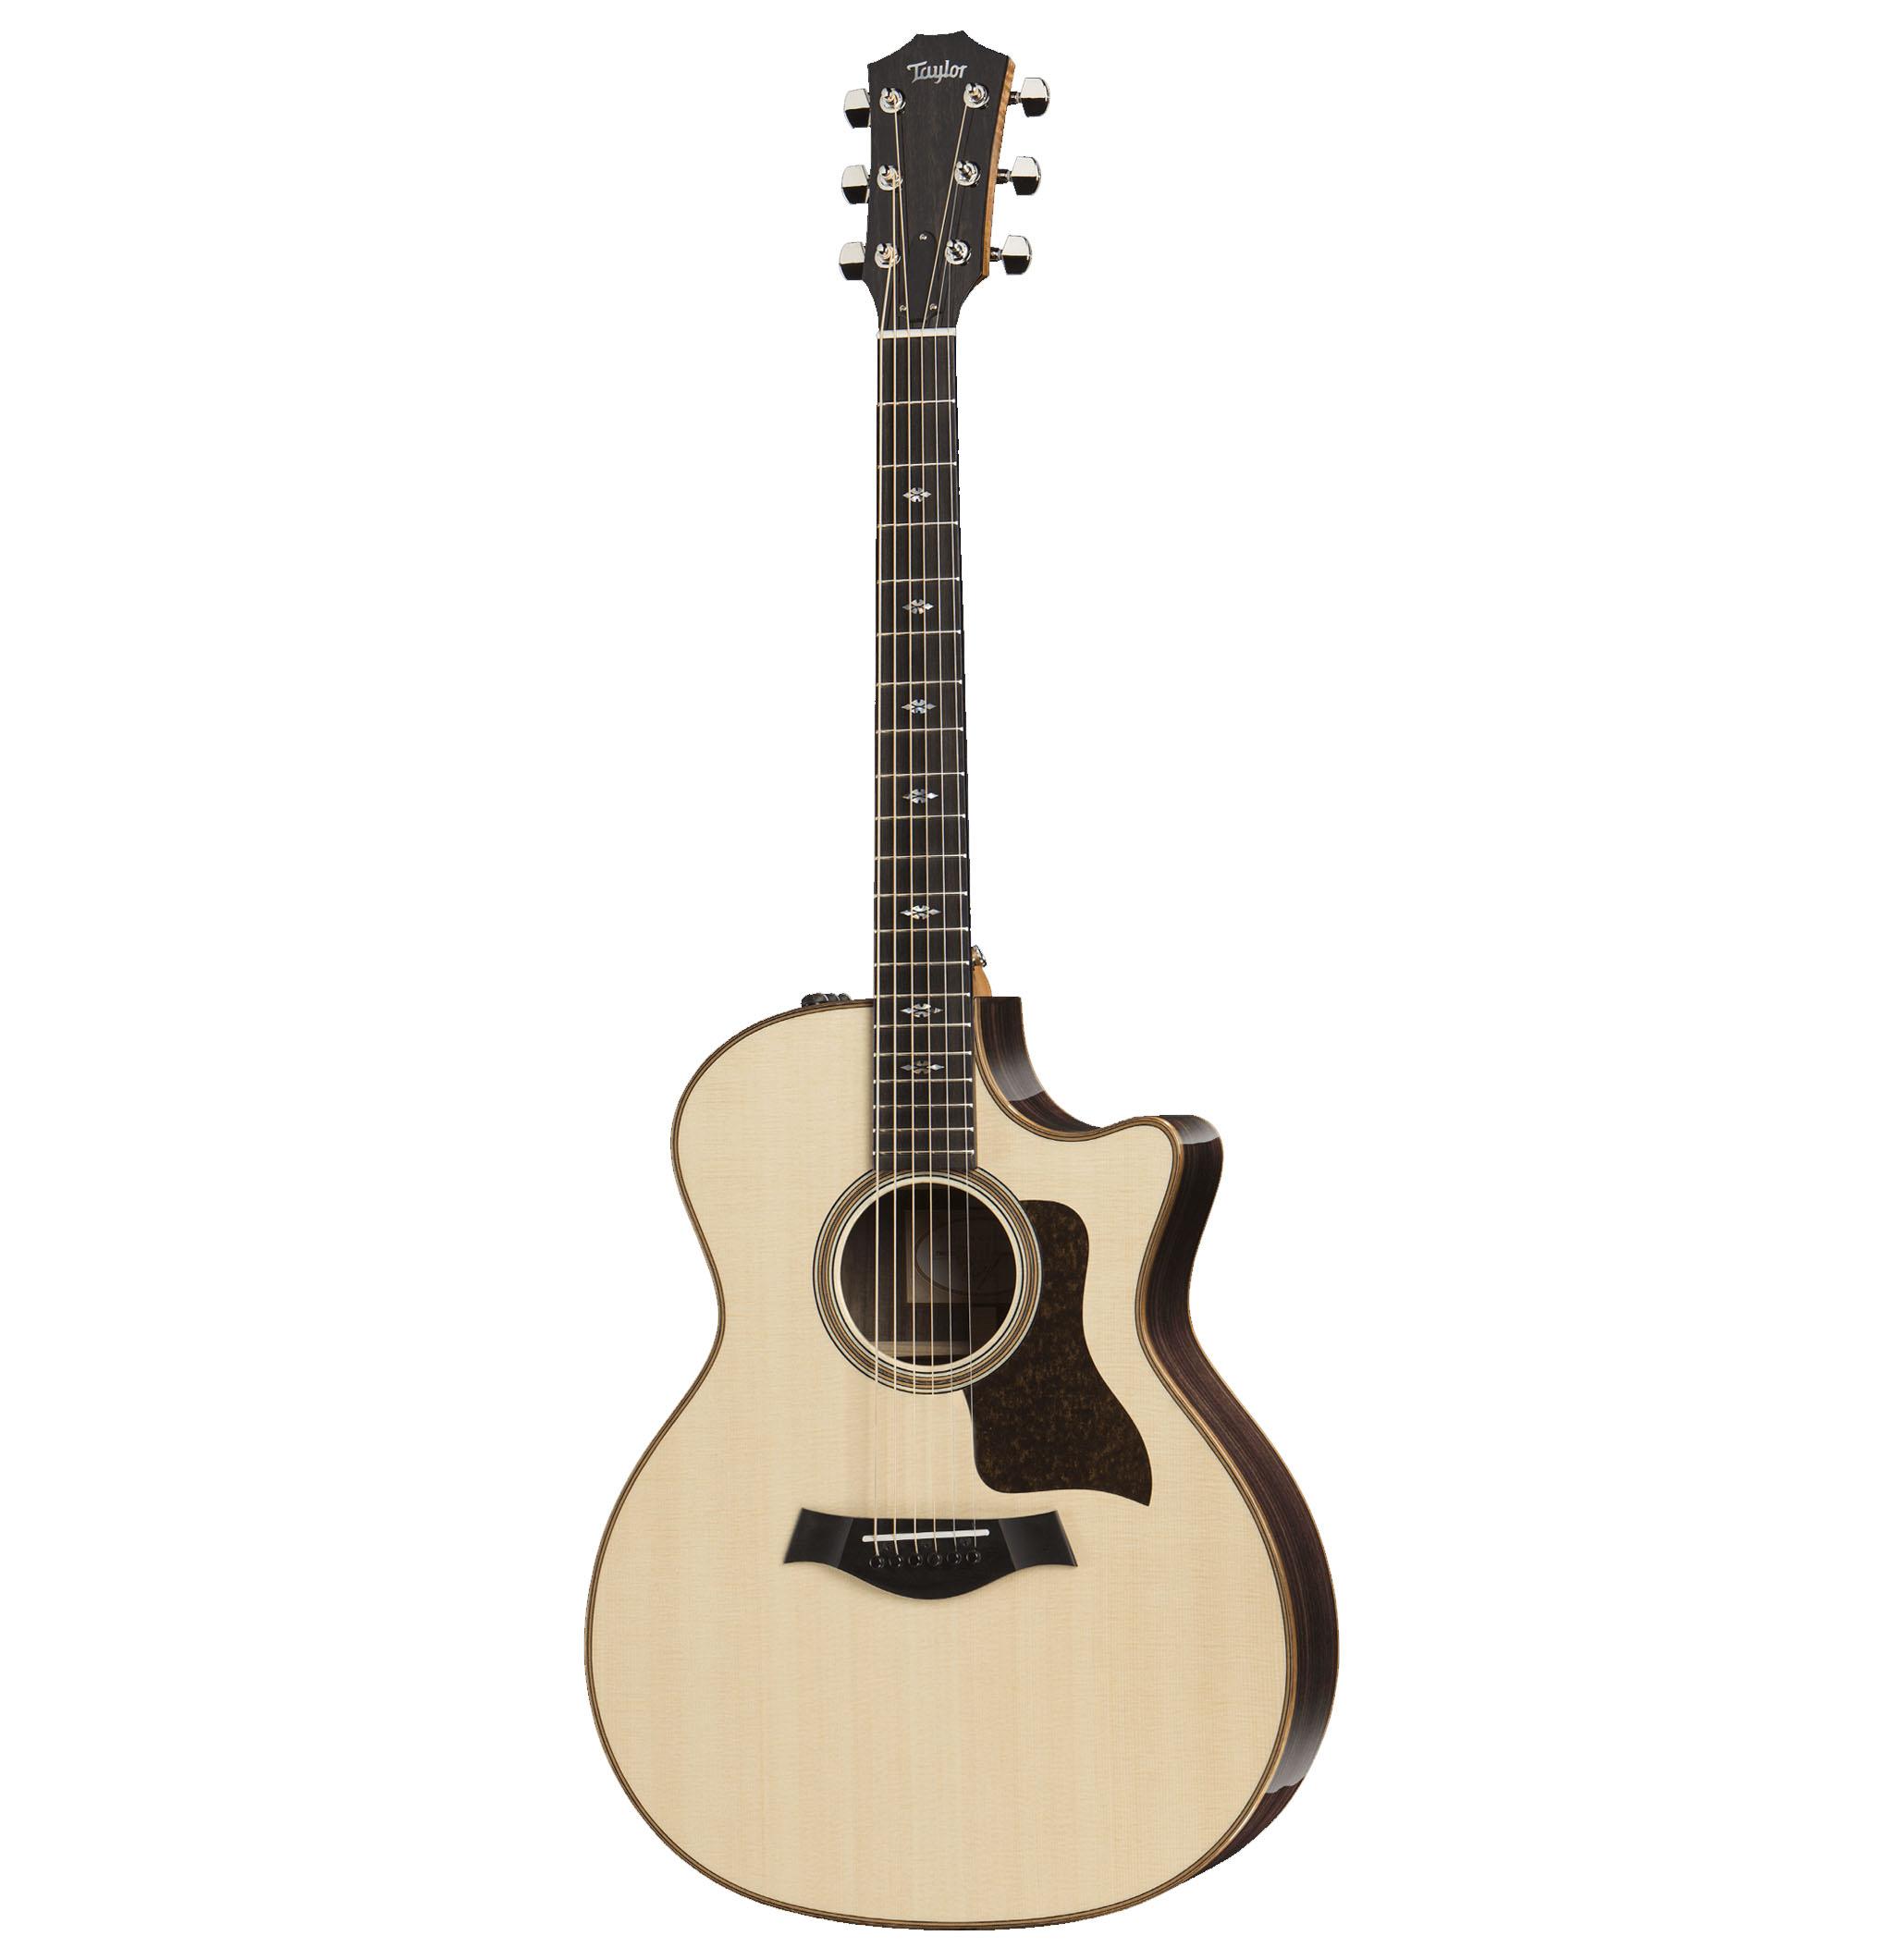 Bán đàn Guitar Taylor 714ce Giá Tốt TP.HCM